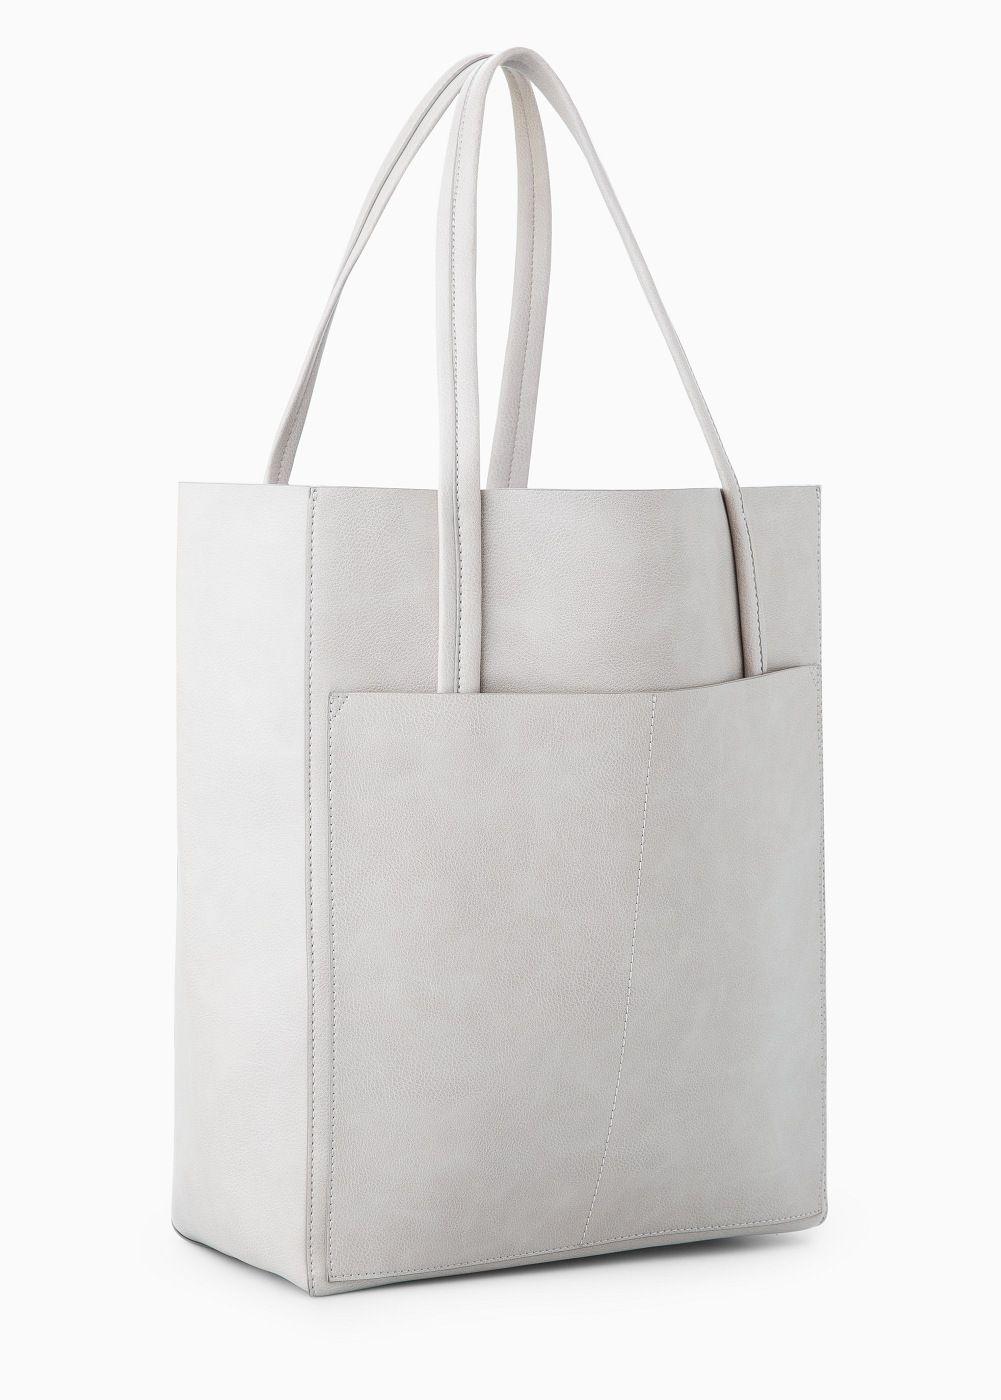 8e50def553a Shopper met zak Lederen Tassen Handgemaakt, Handgemaakte Tassen, Zwart  Lederen Tassen, Winkeltas,